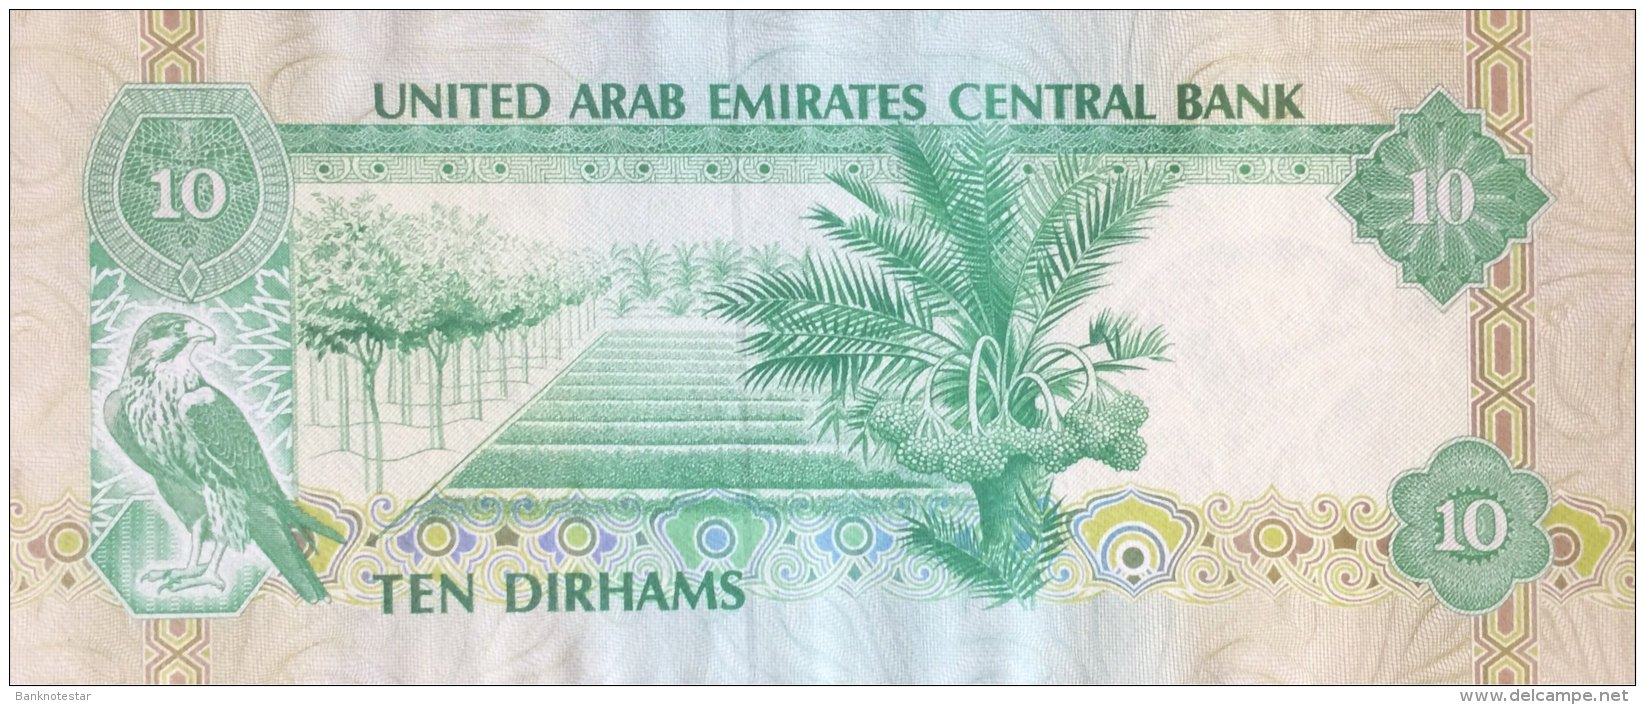 United Arab Emirates 10 Dirhams, P-8a (1982) - EF/XF - Ver. Arab. Emirate